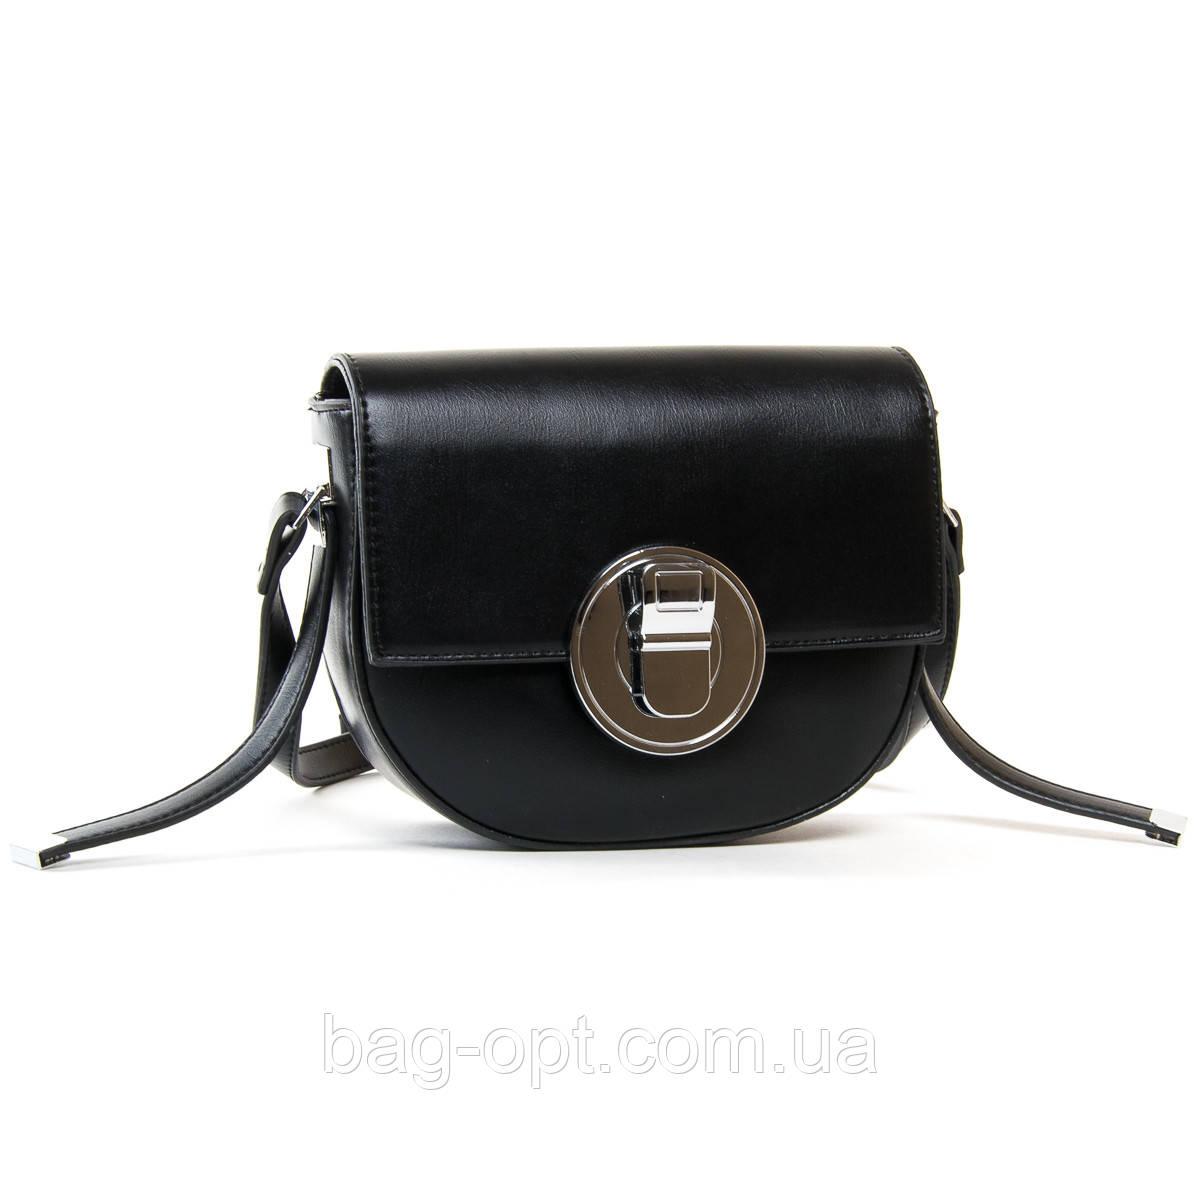 Клатч женский Fashion (19x16x7 см) black